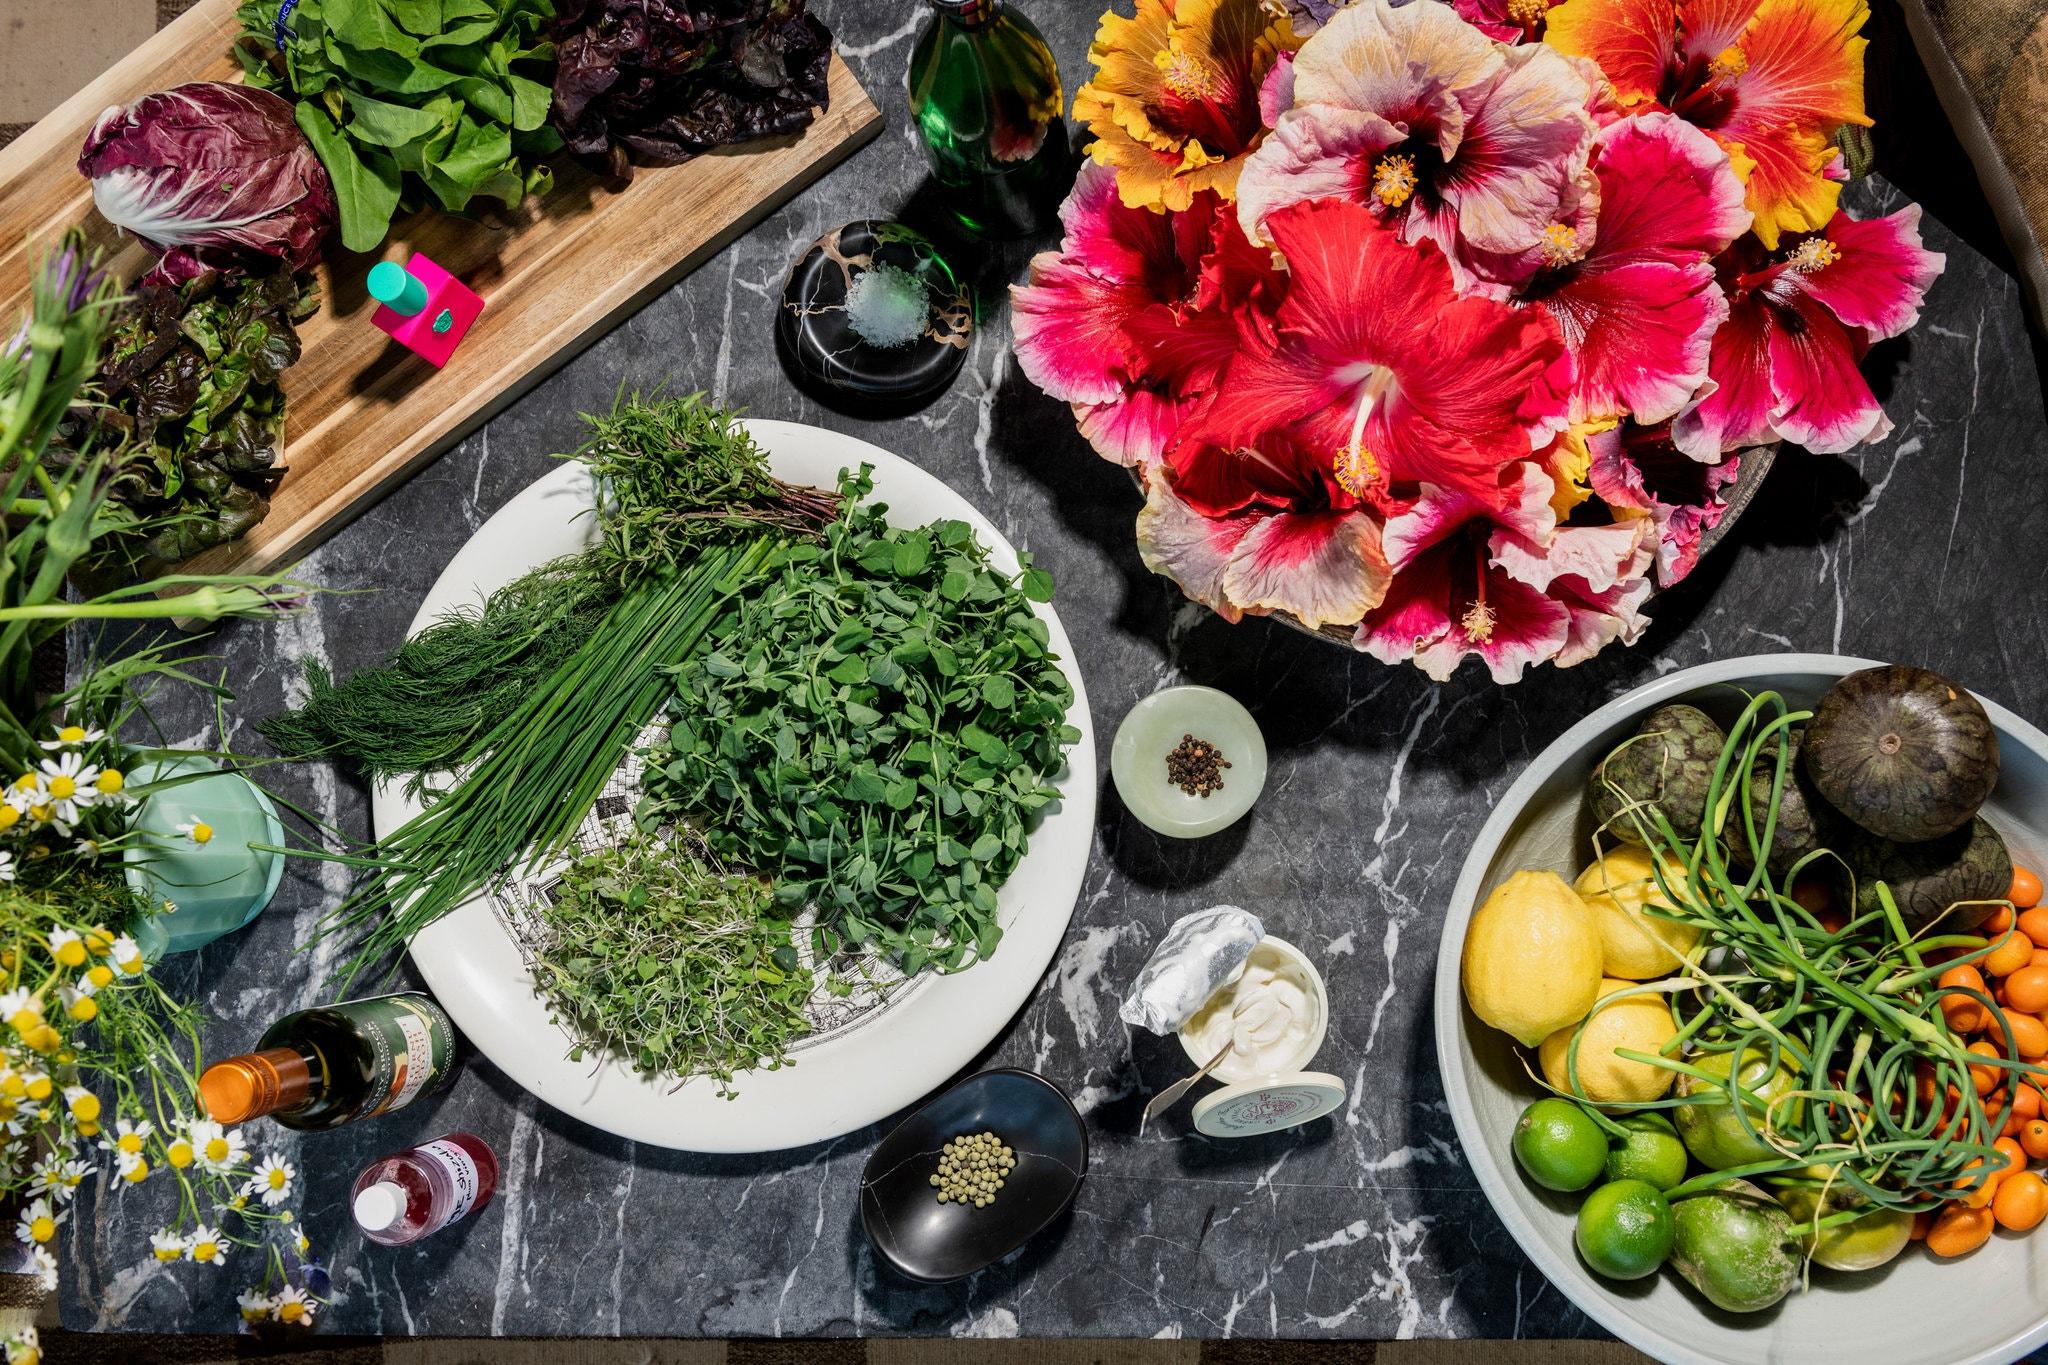 Flower-based salad and recipe by perfumer Ezra Woods.